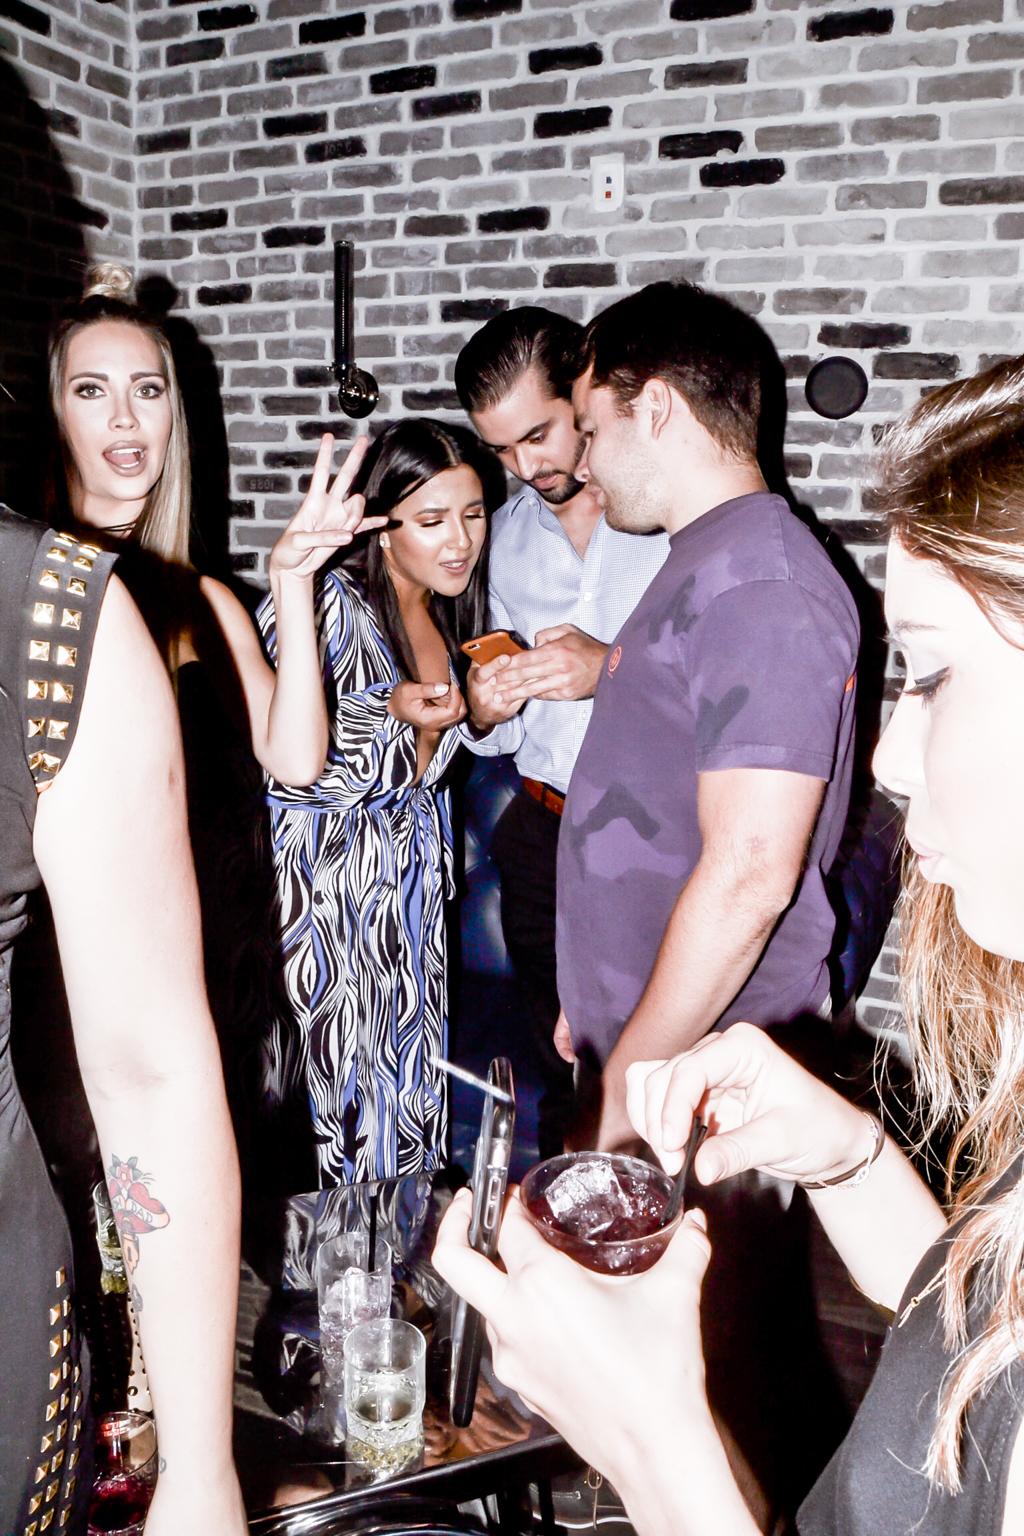 miami-events-illy-perez-fashion-photography-103.jpg